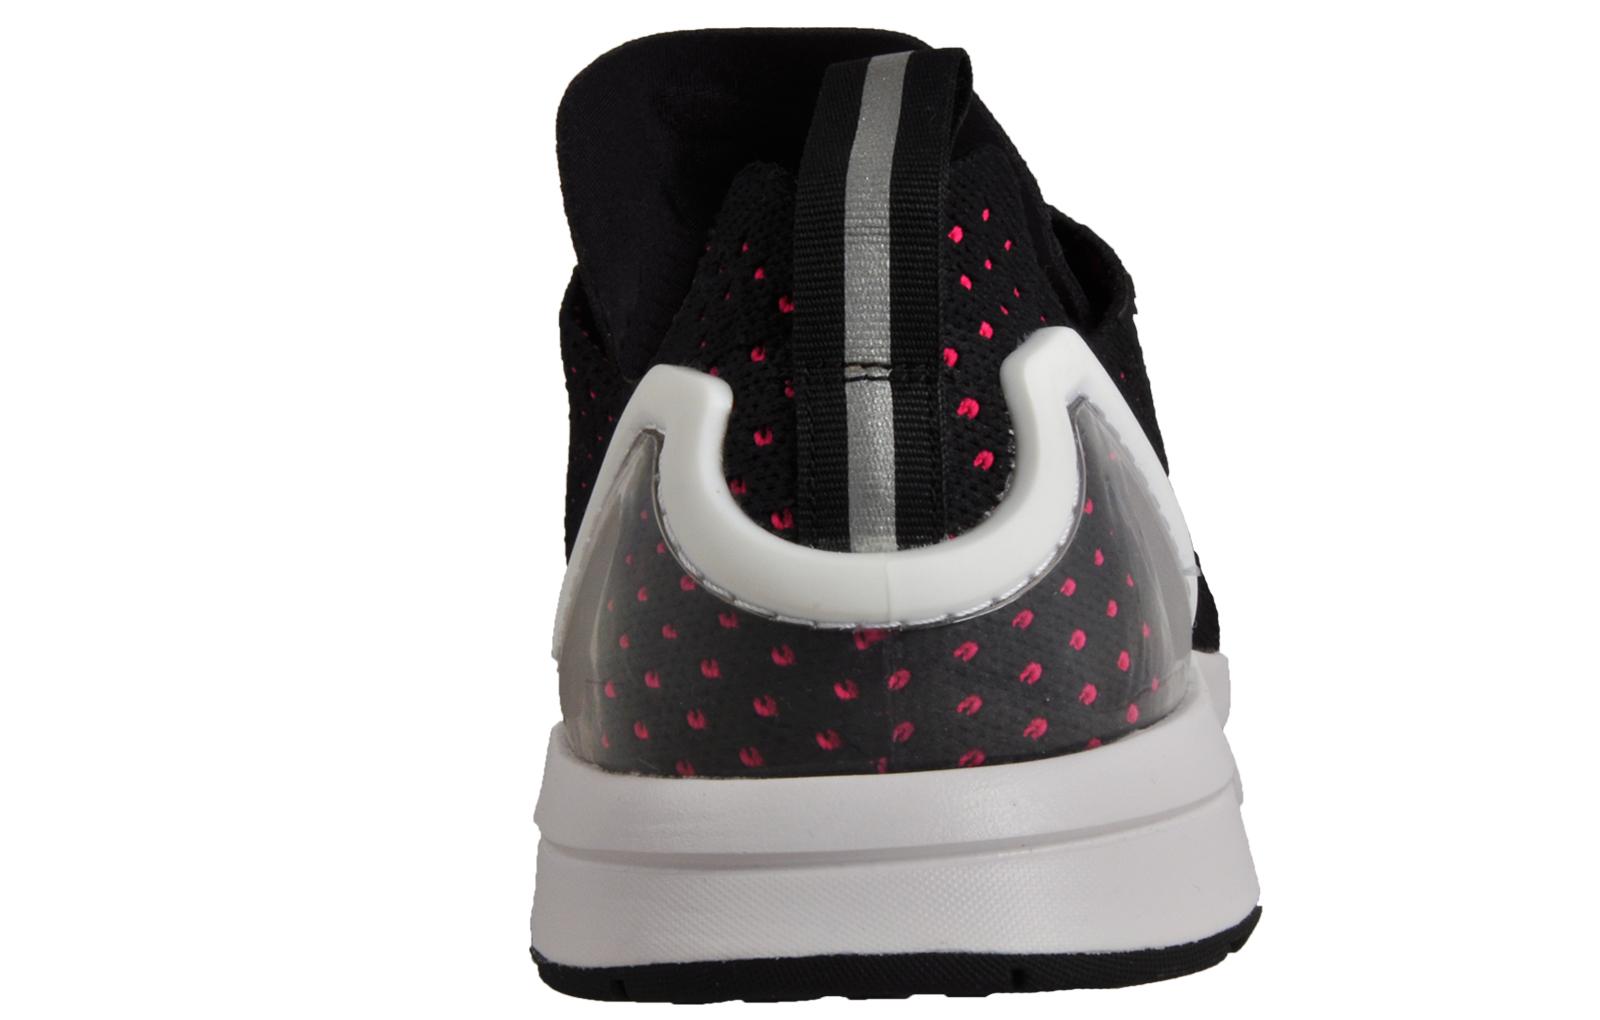 167b9dc41 Adidas Originals ZX Flux ADV Asymmetrical Primeknit Mens Casual Gym  Trainers Black